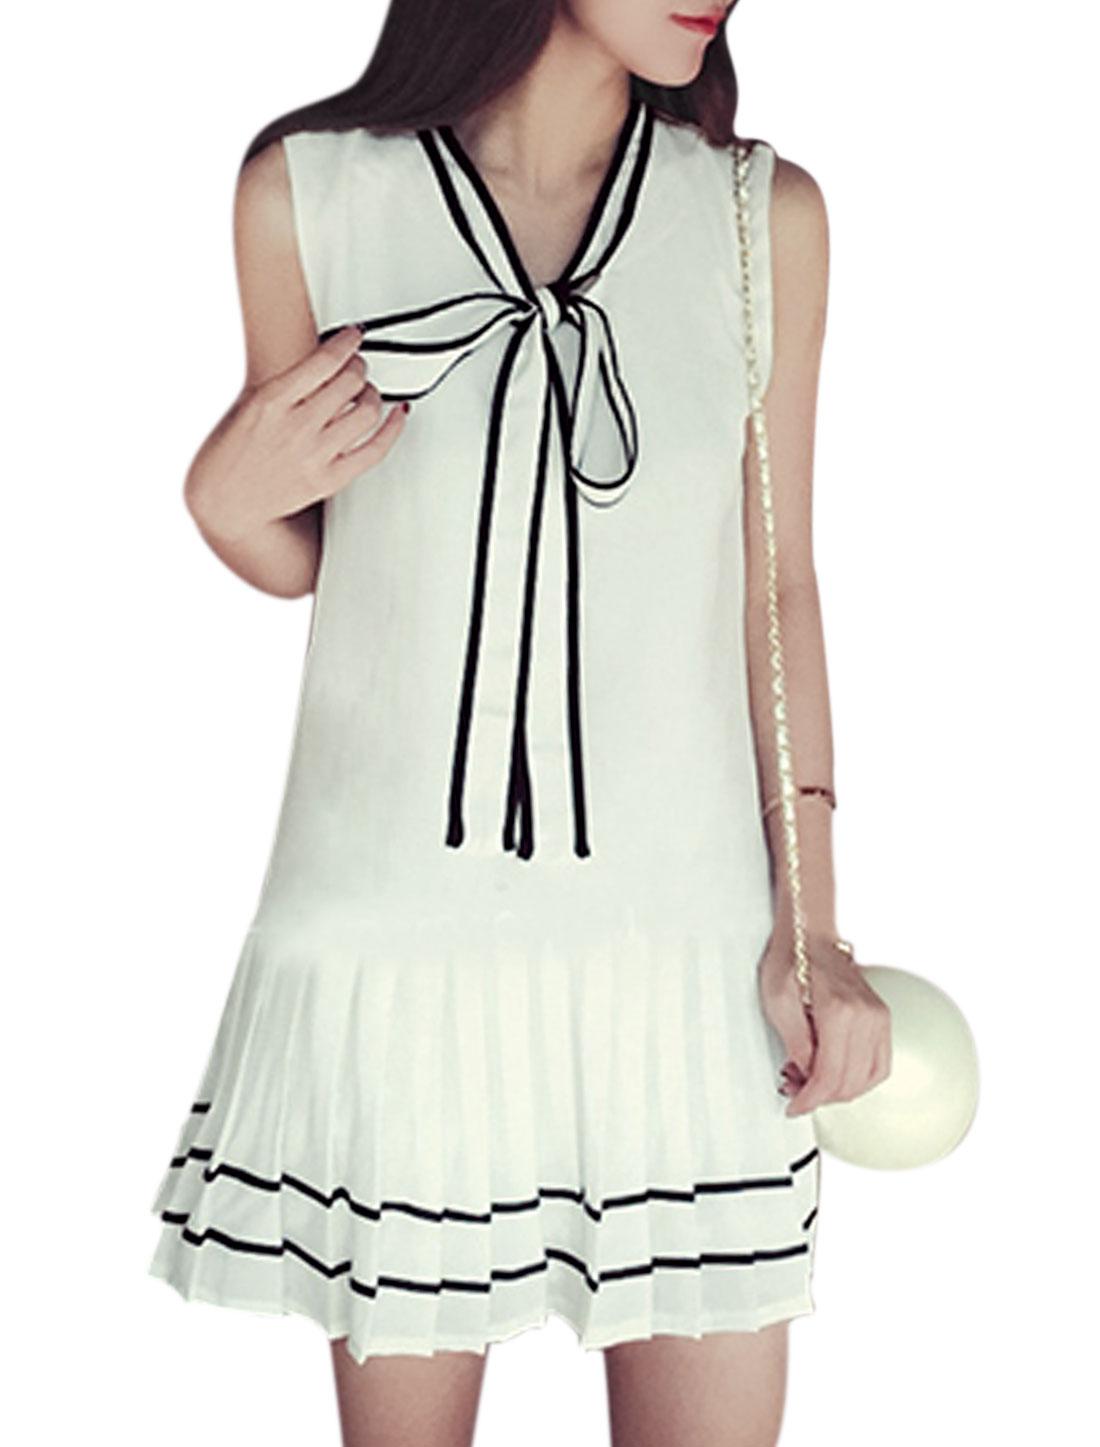 Ladies Sleeveless Self Tie Collar Pleated Hem Unlined Casual Dress White XS